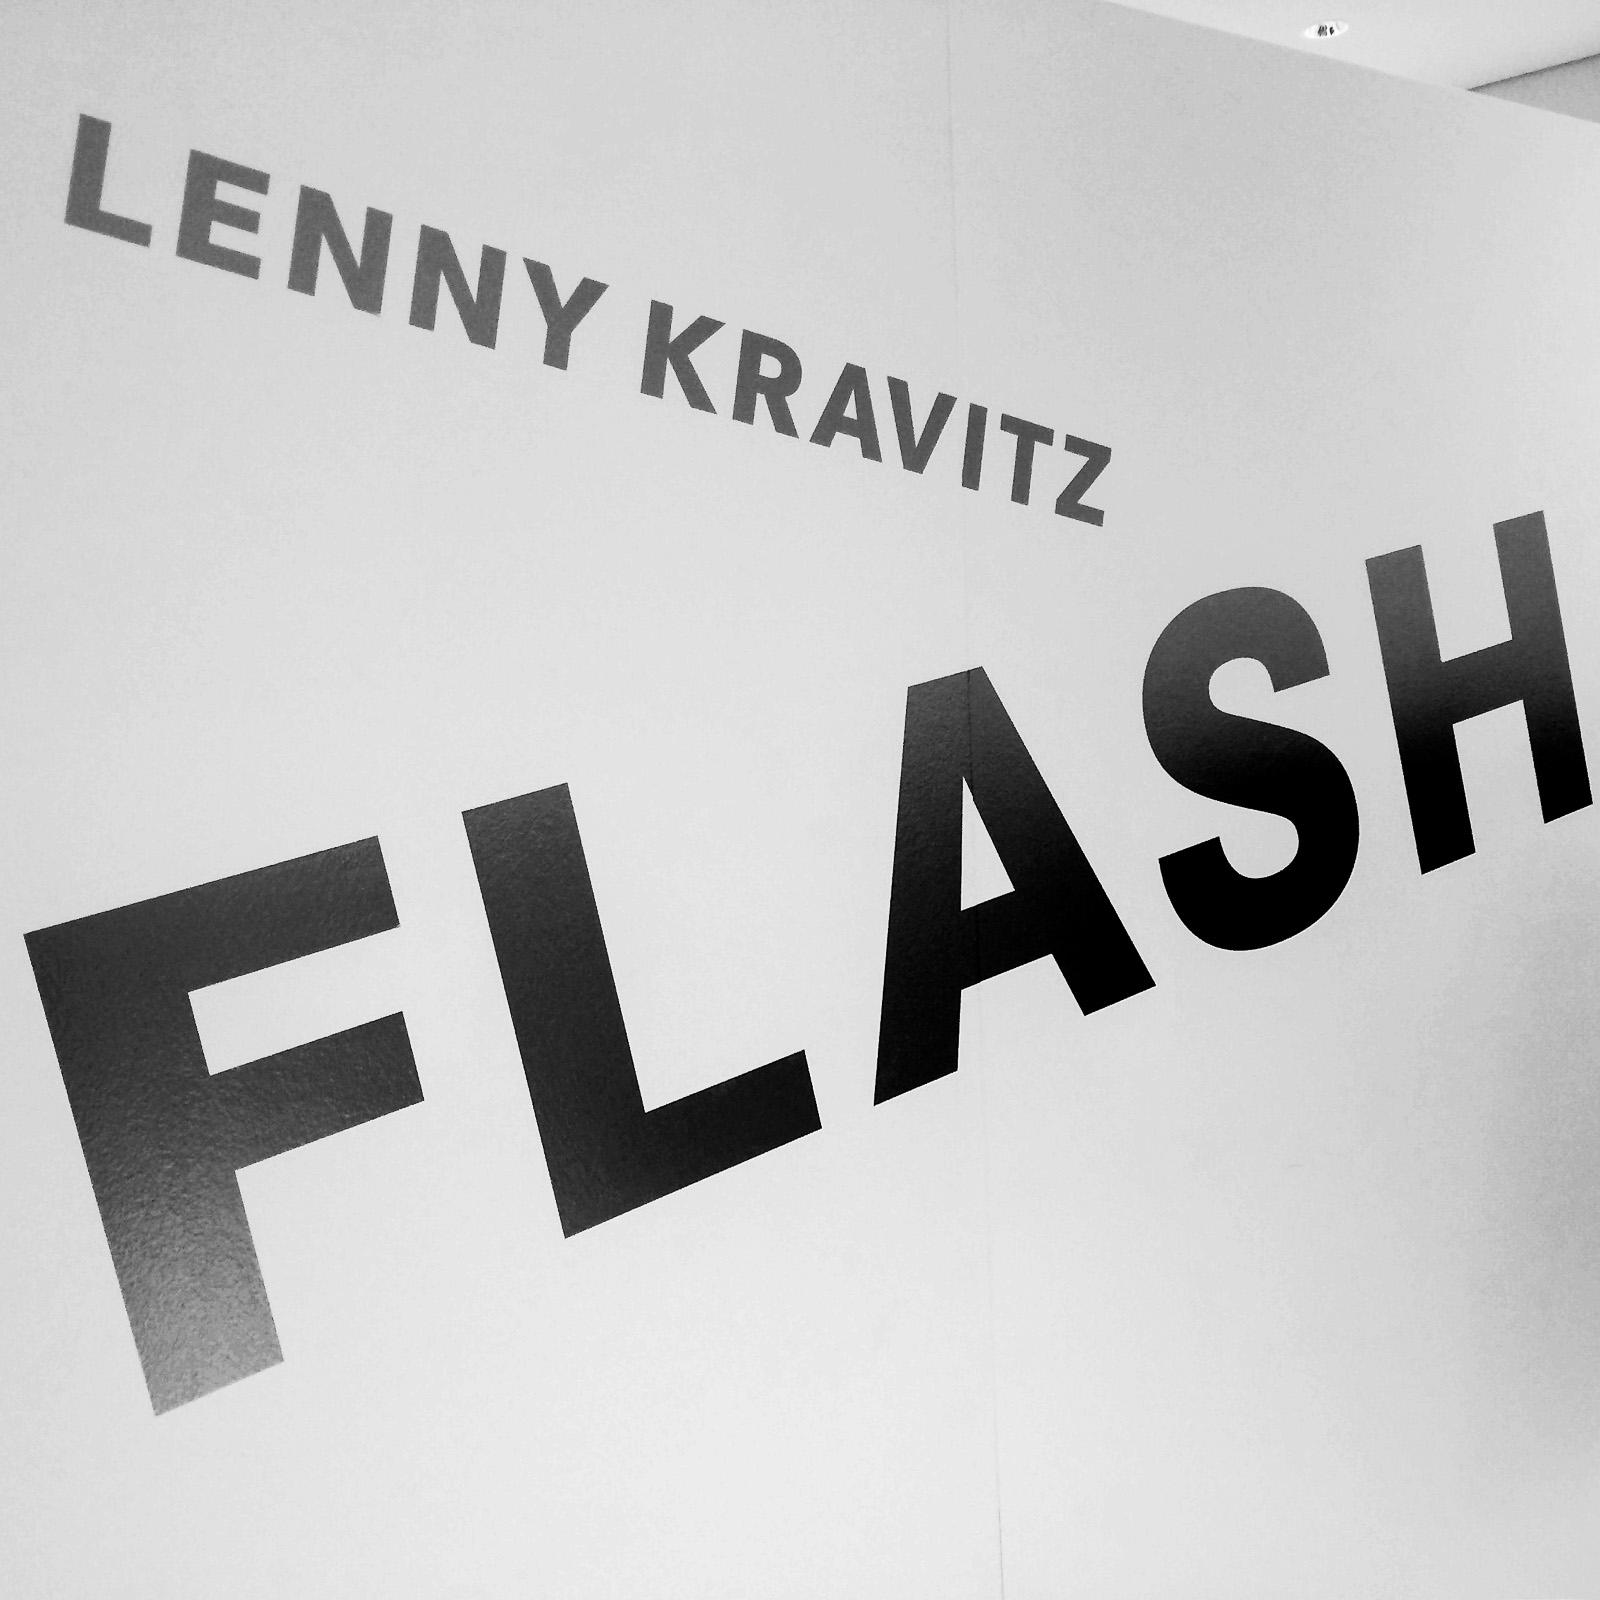 Leica_LennyKravitz1-3.jpg